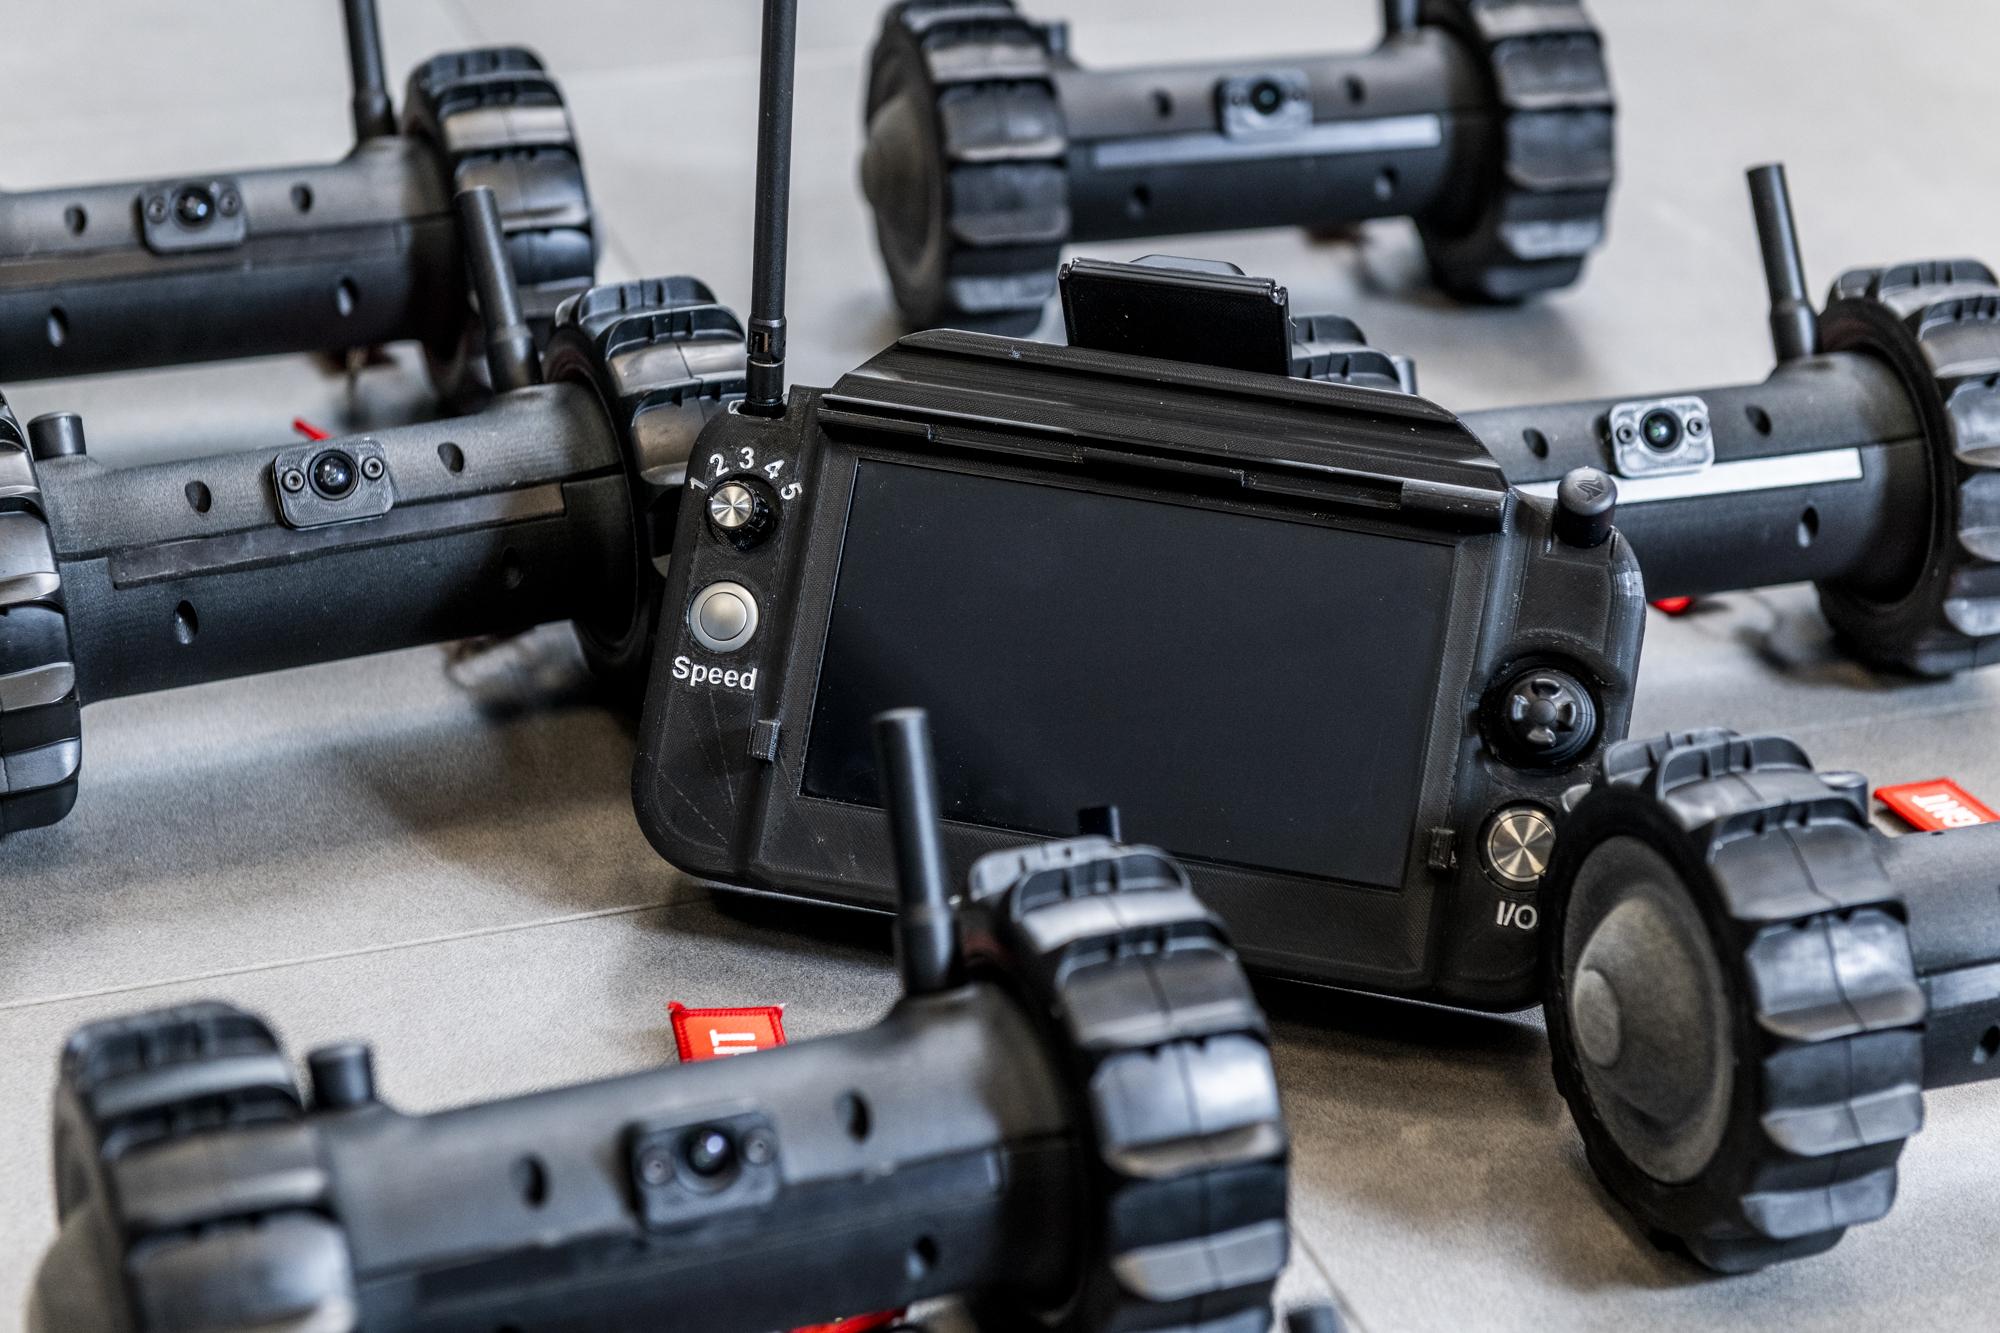 GCS Controller and Sita Robots